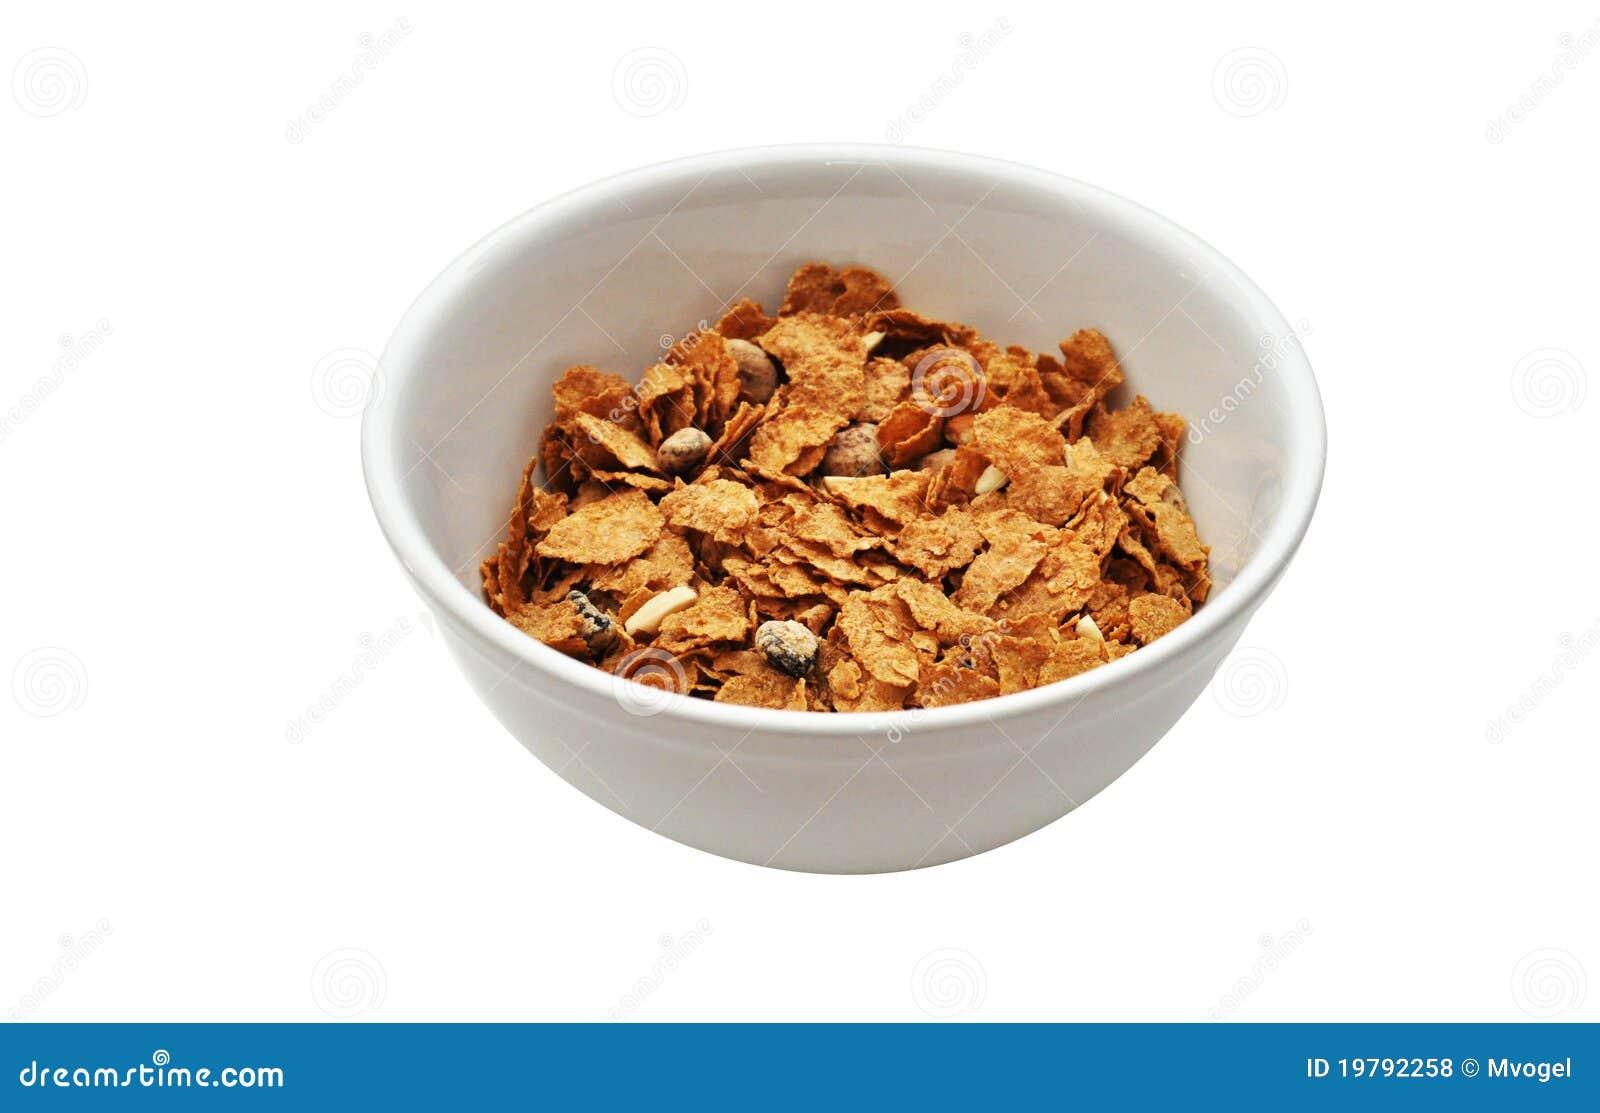 Download Breakfast Cereal stock photo. Image of ease, breakfast - 19792258